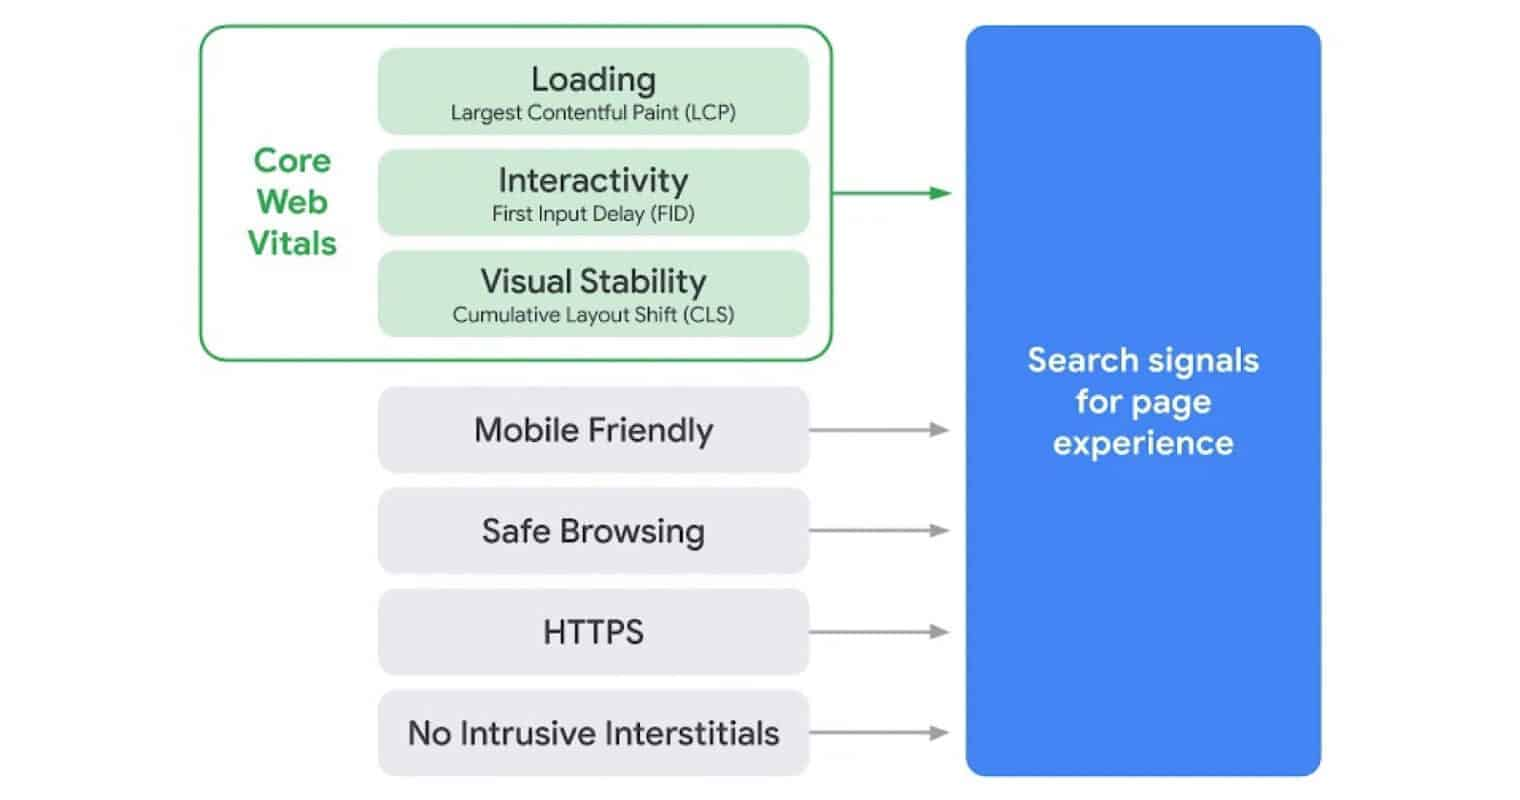 De verschillende ranking factoren voor Google Search (Search signals for page experience)